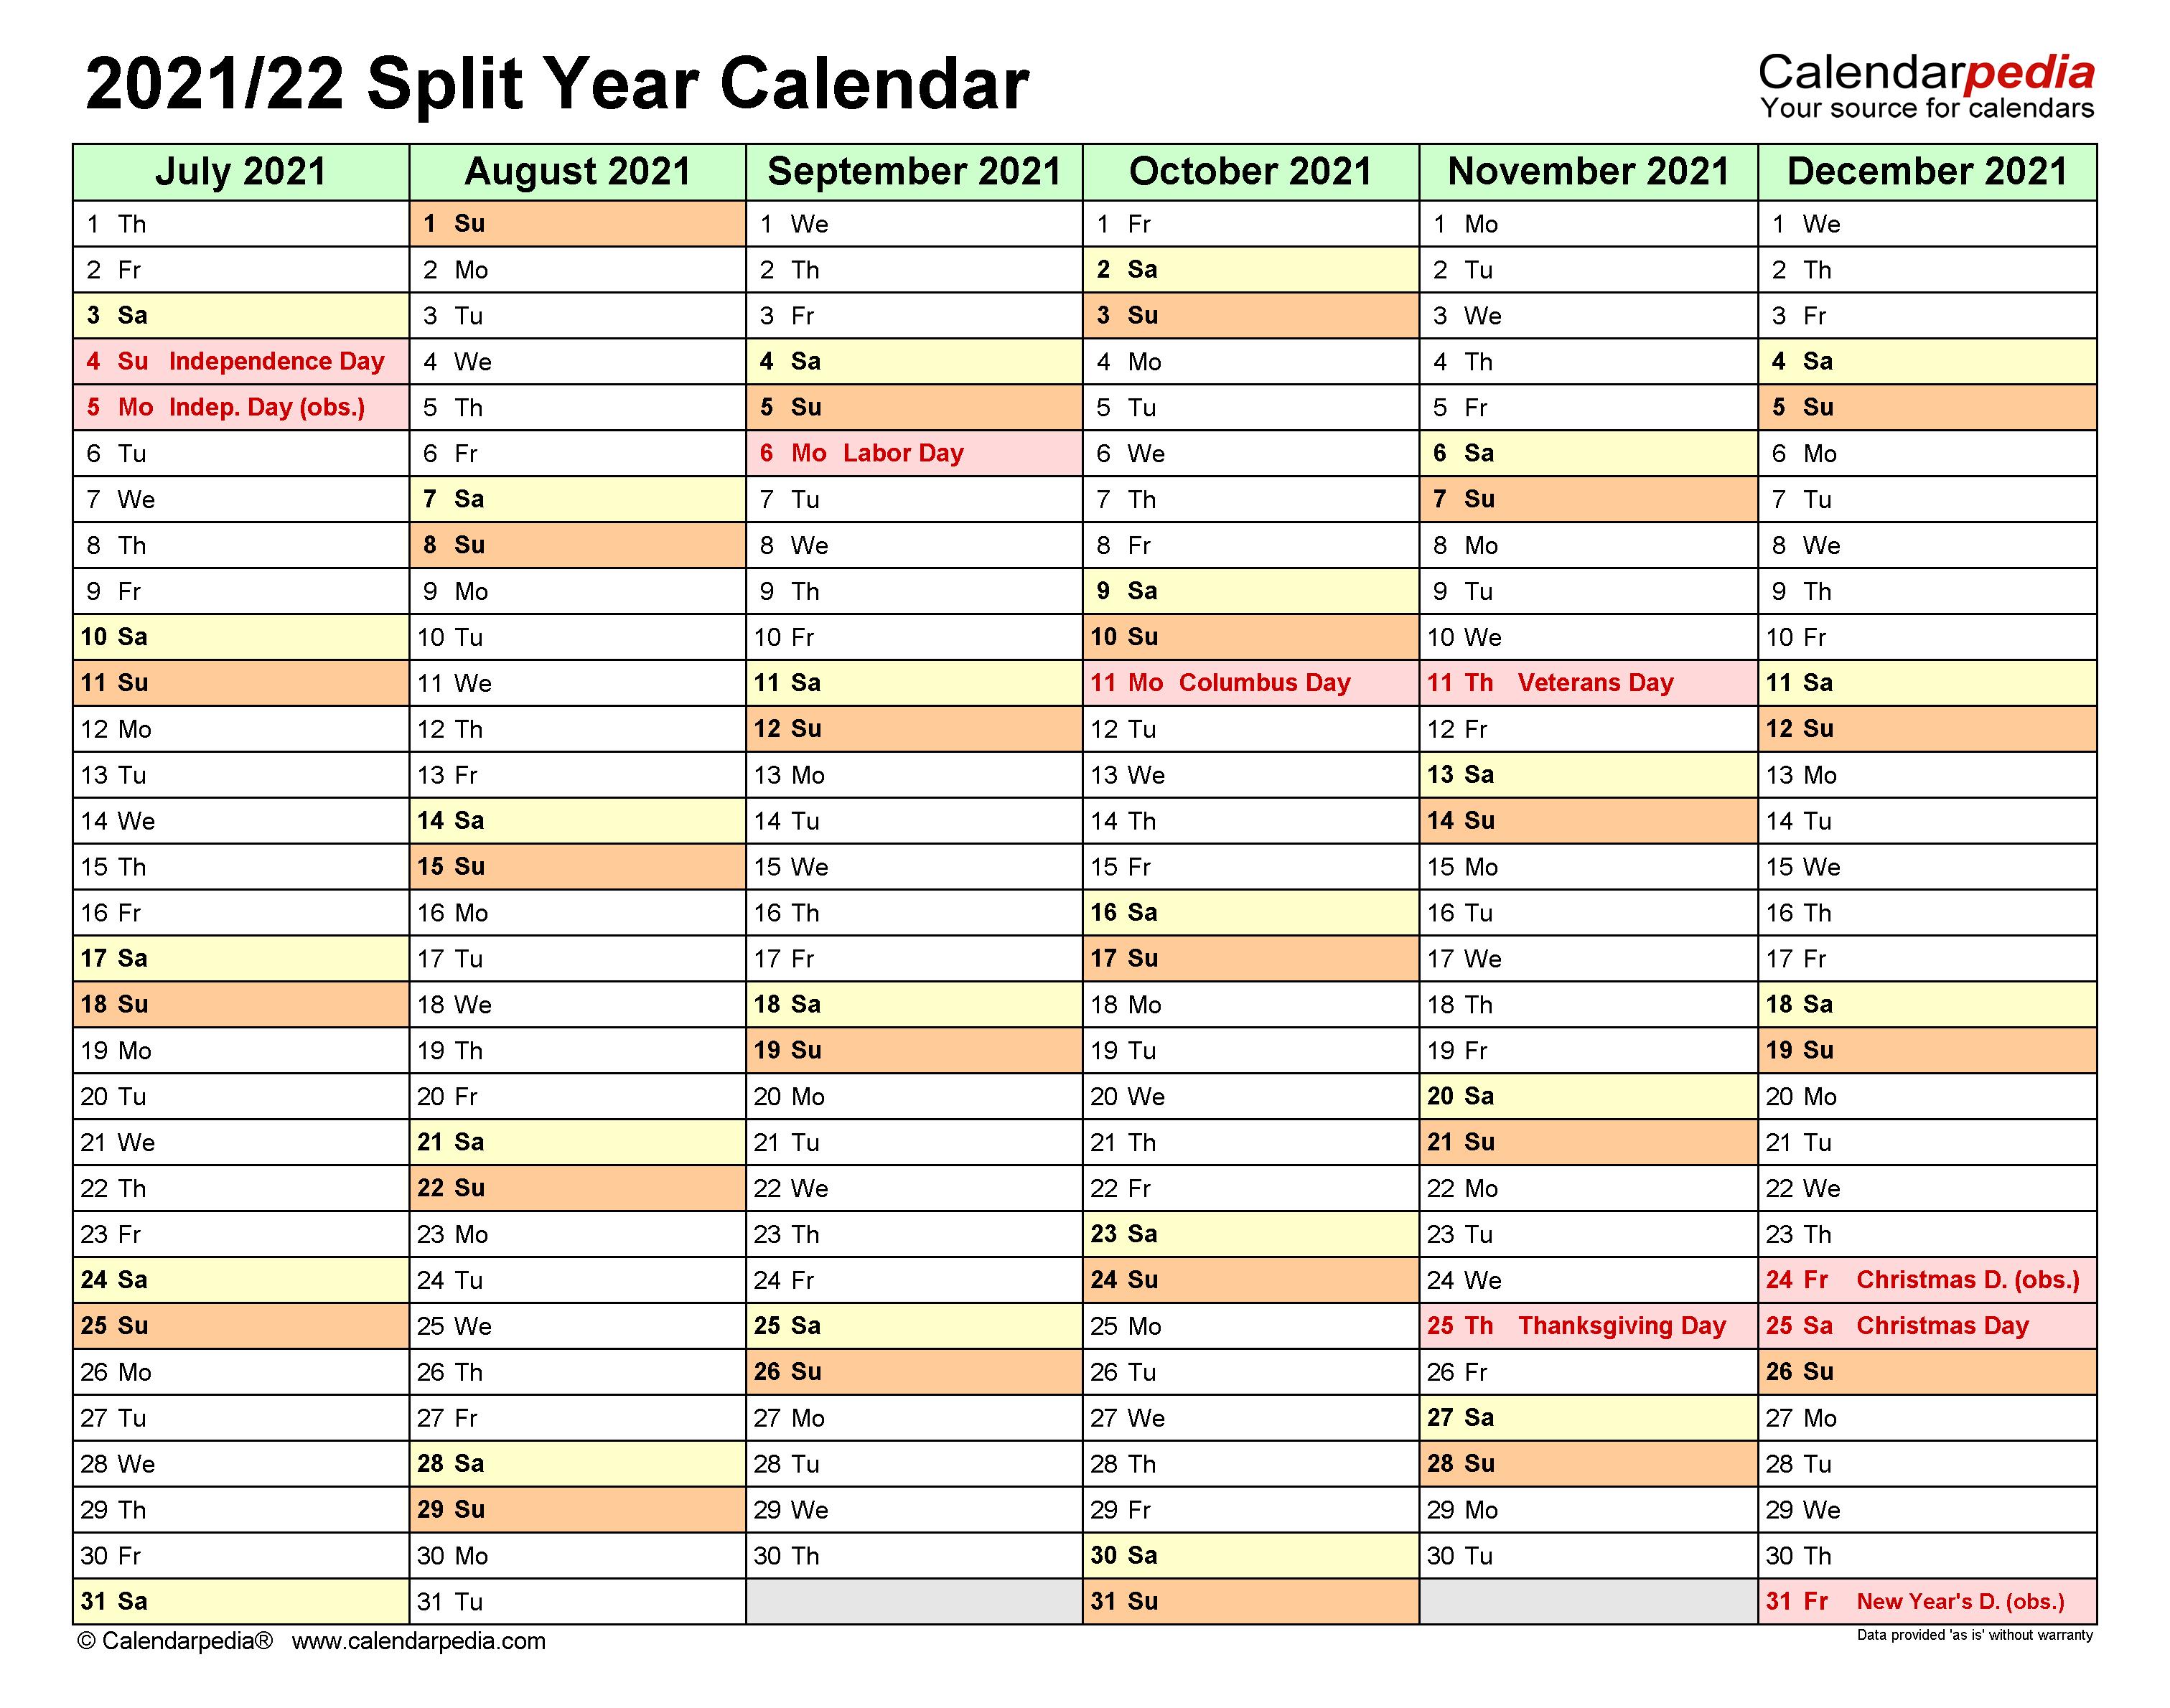 Purdue Calendar 2022 23.Split Year Calendars 2021 2022 July To June Excel Templates